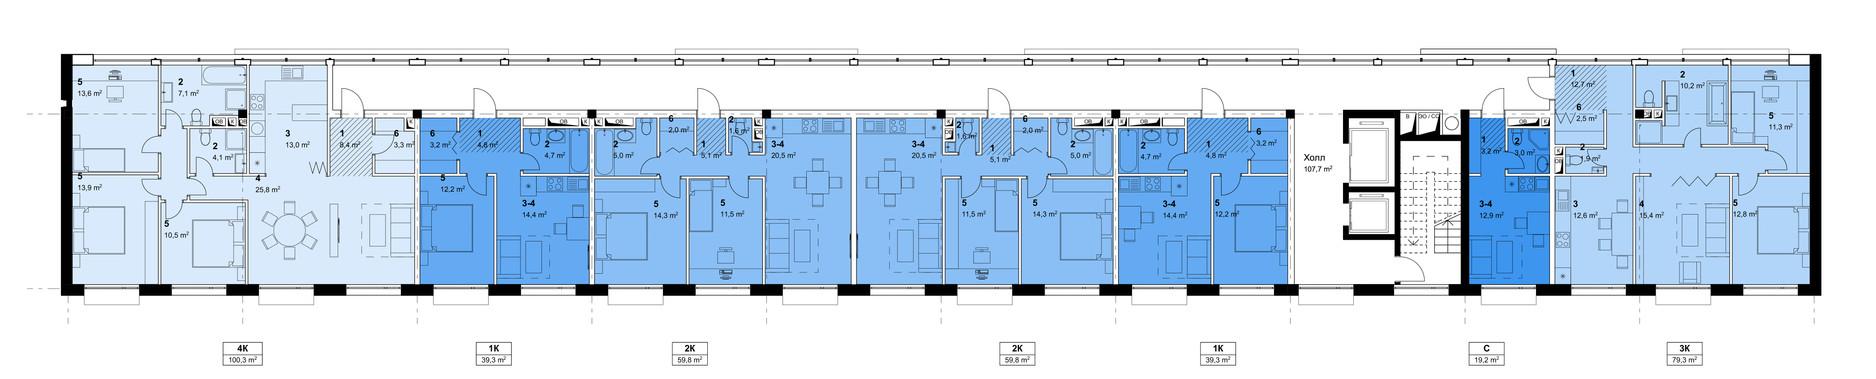 2, 3, 4 floors